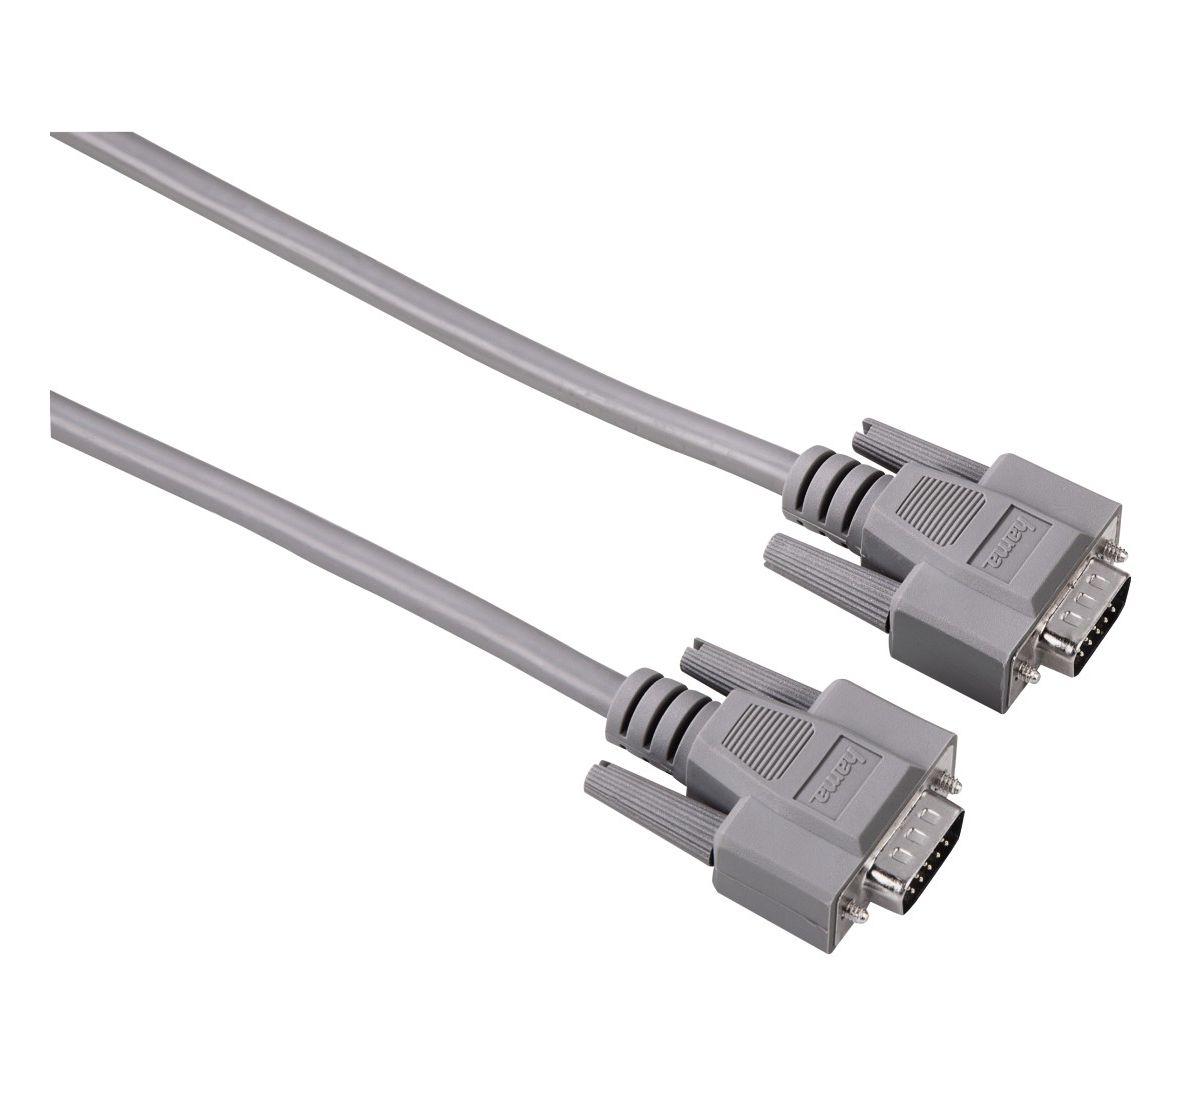 Hama VGA-Kabel, geschirmt, 1,80 m